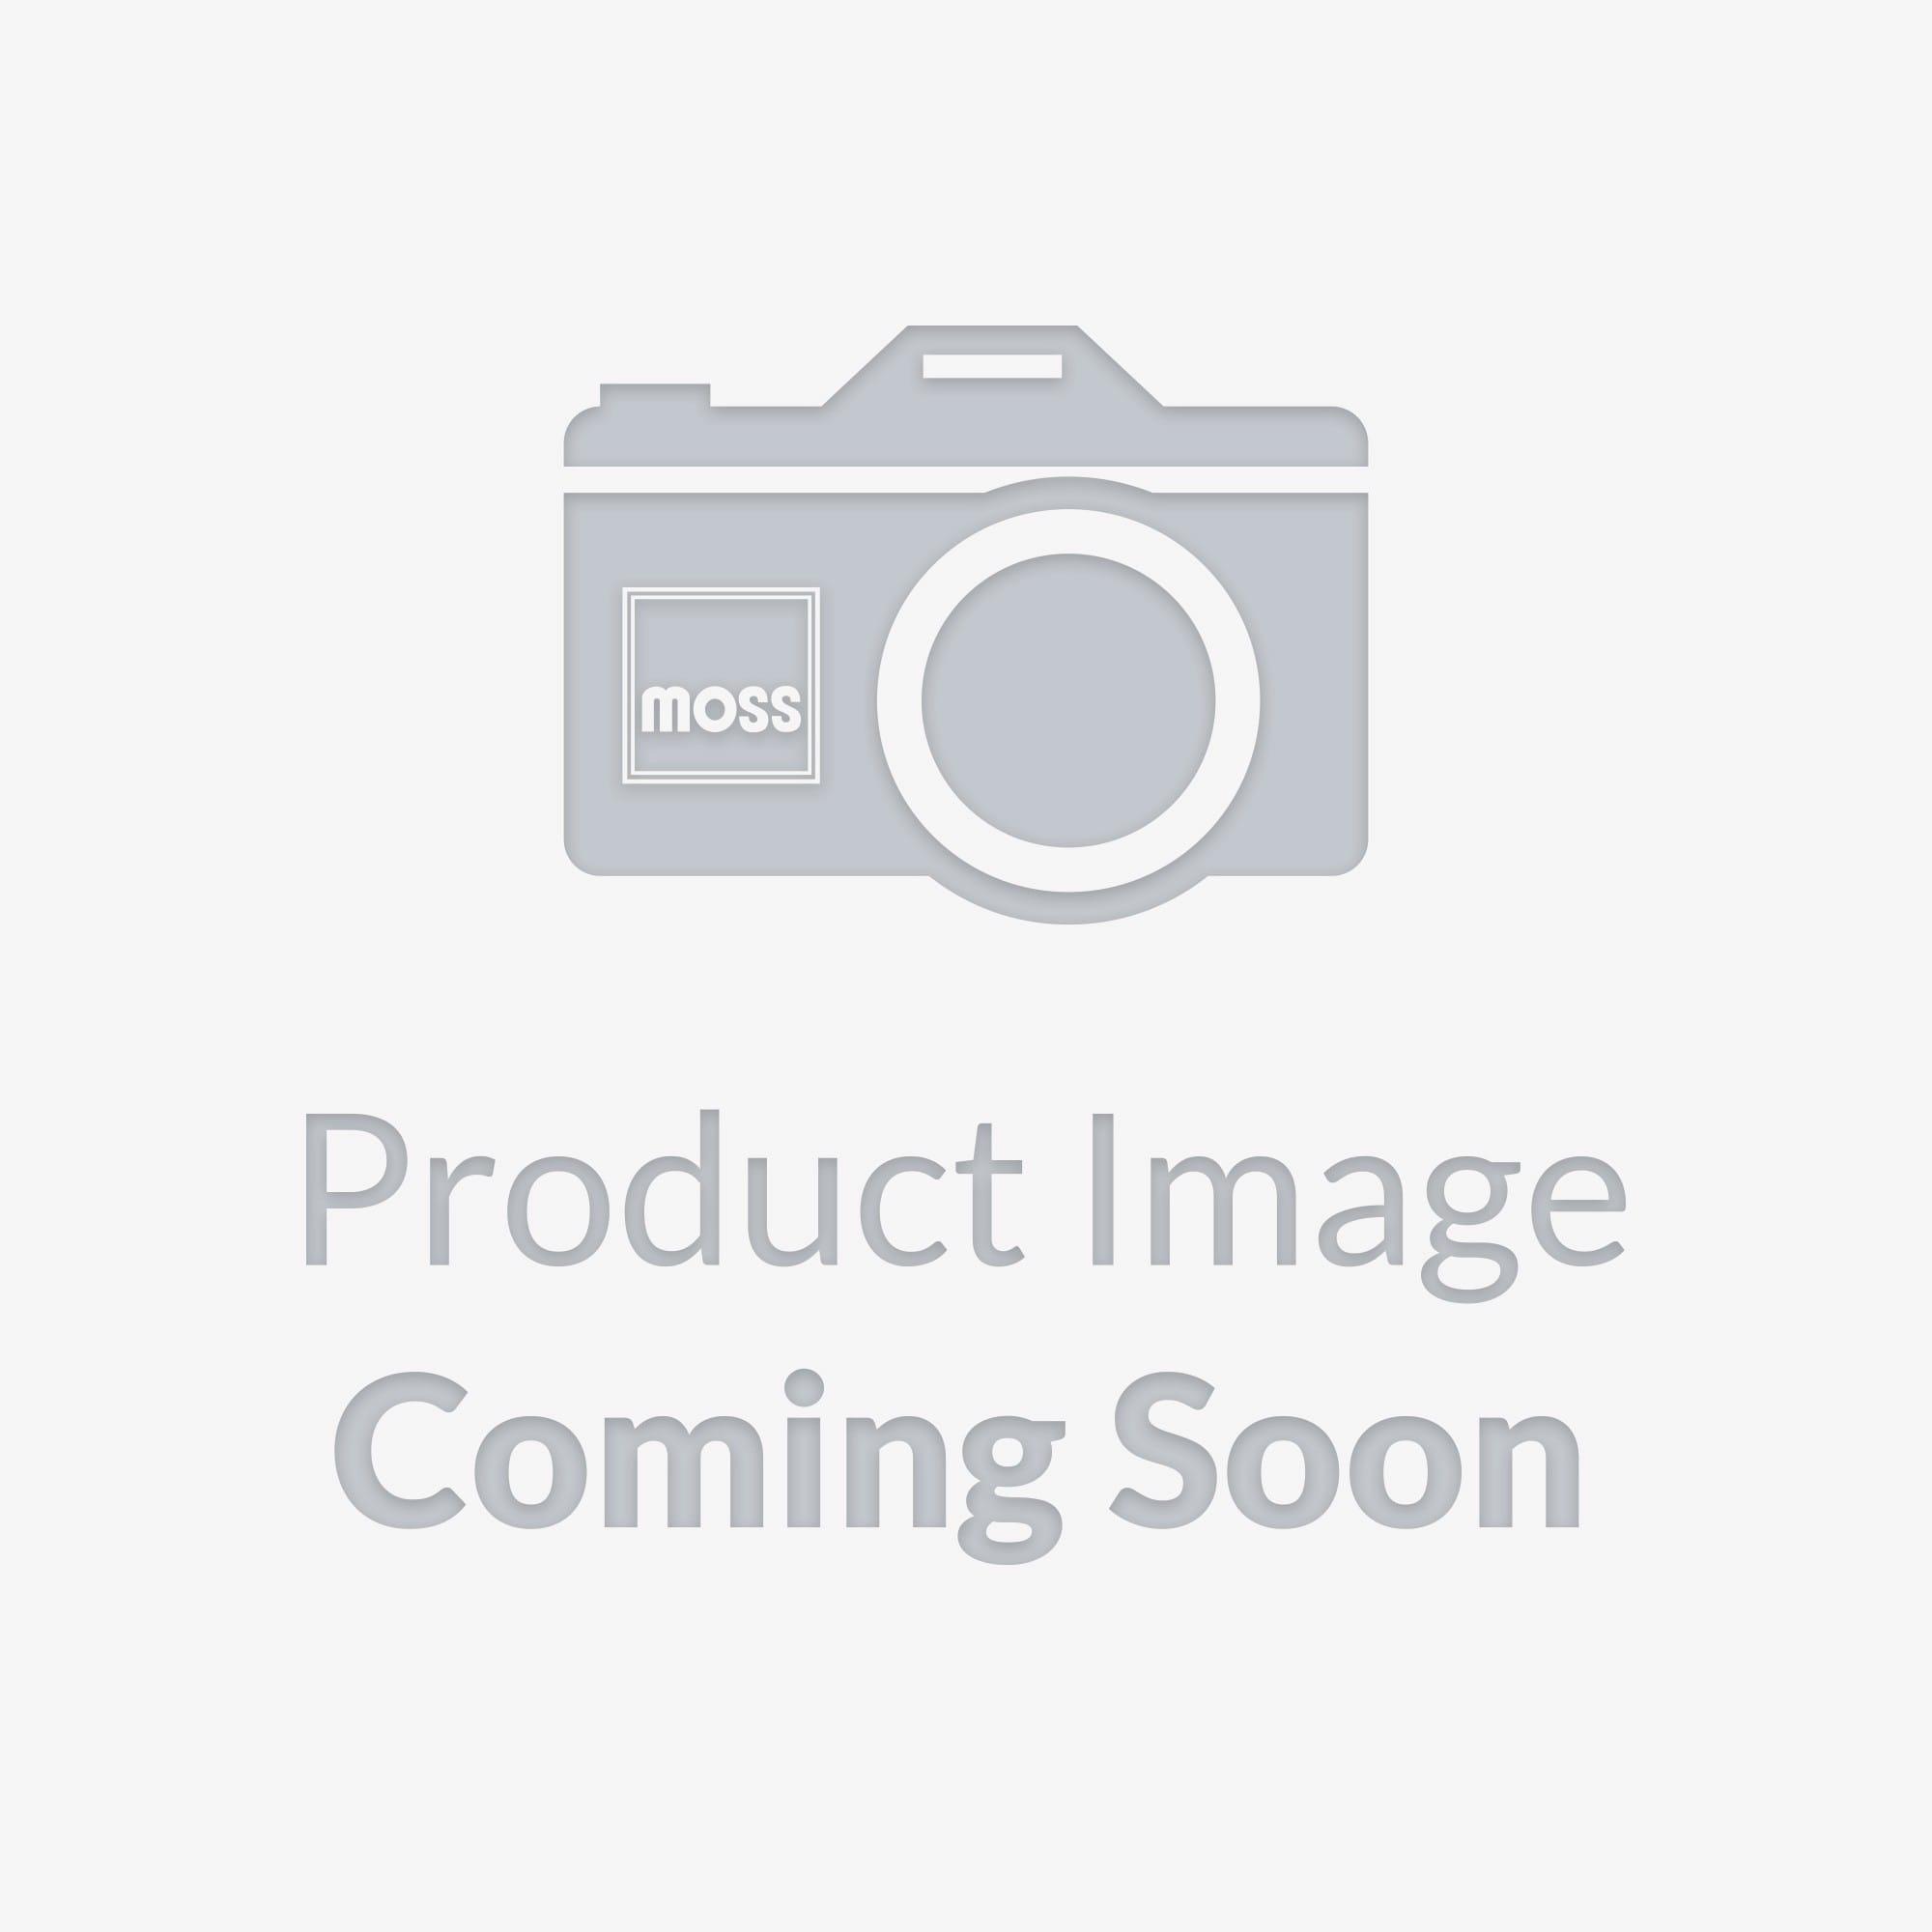 Wheels & Knockoffs - Wheels & Tires - MGB | Moss Motors